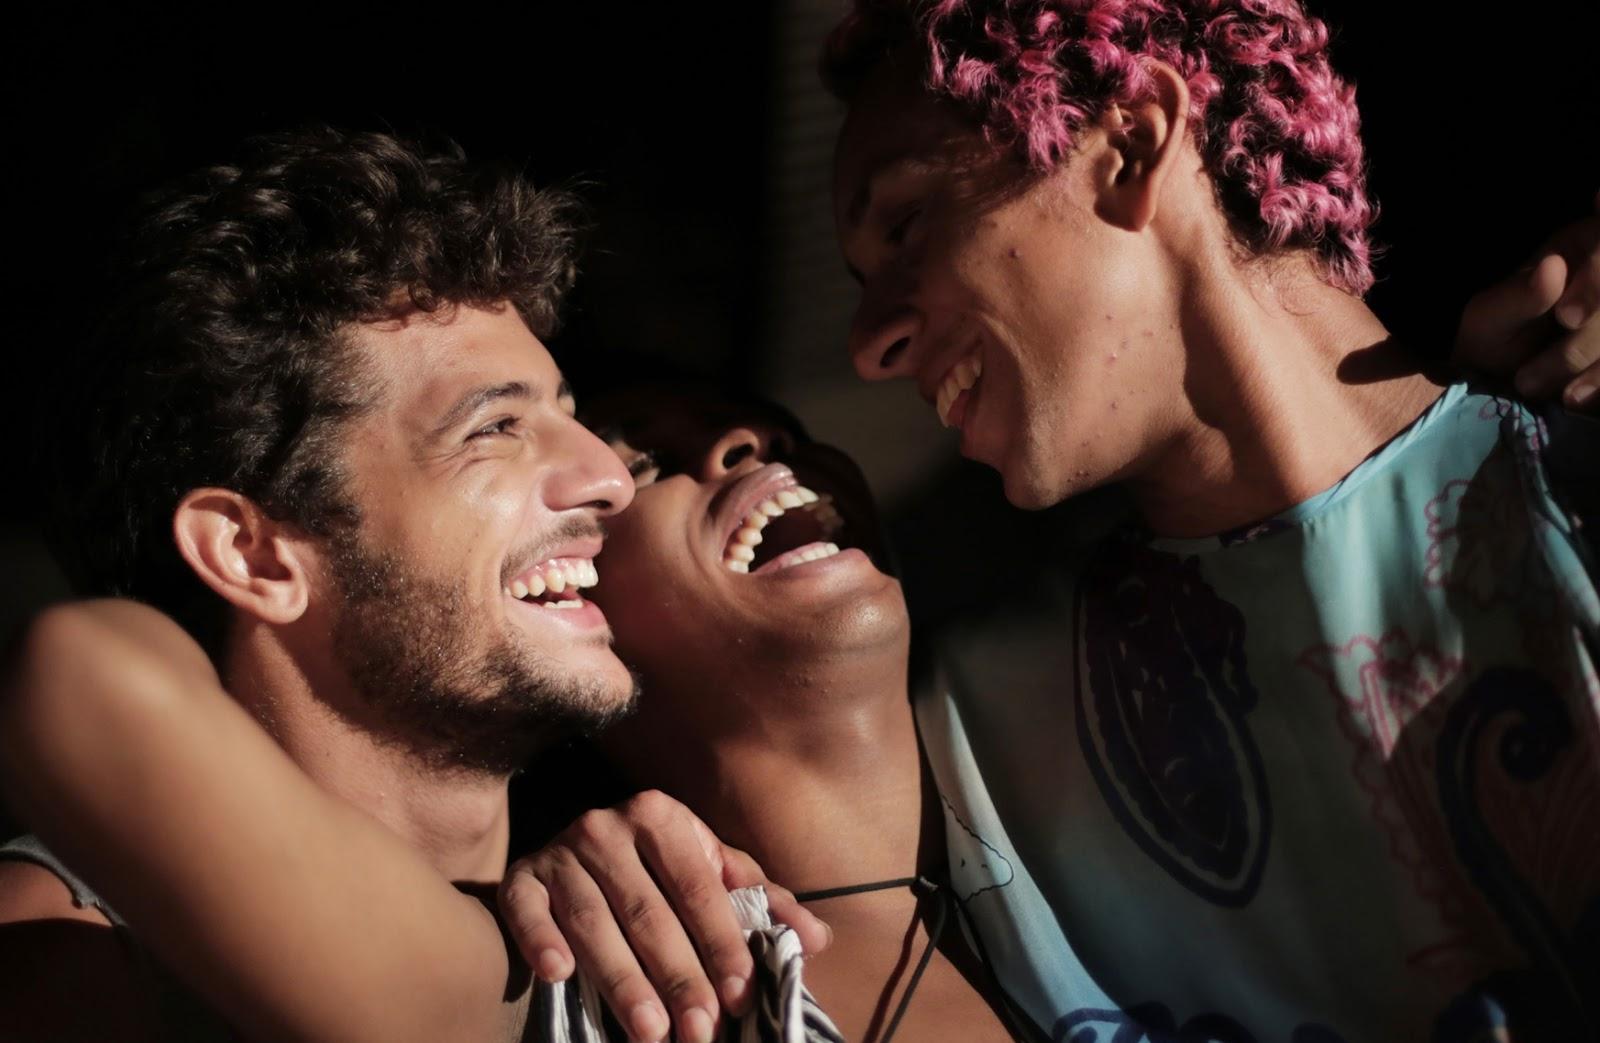 Filme Africano intended for r e v i d e: corpo elétrico, de marcelo caetano